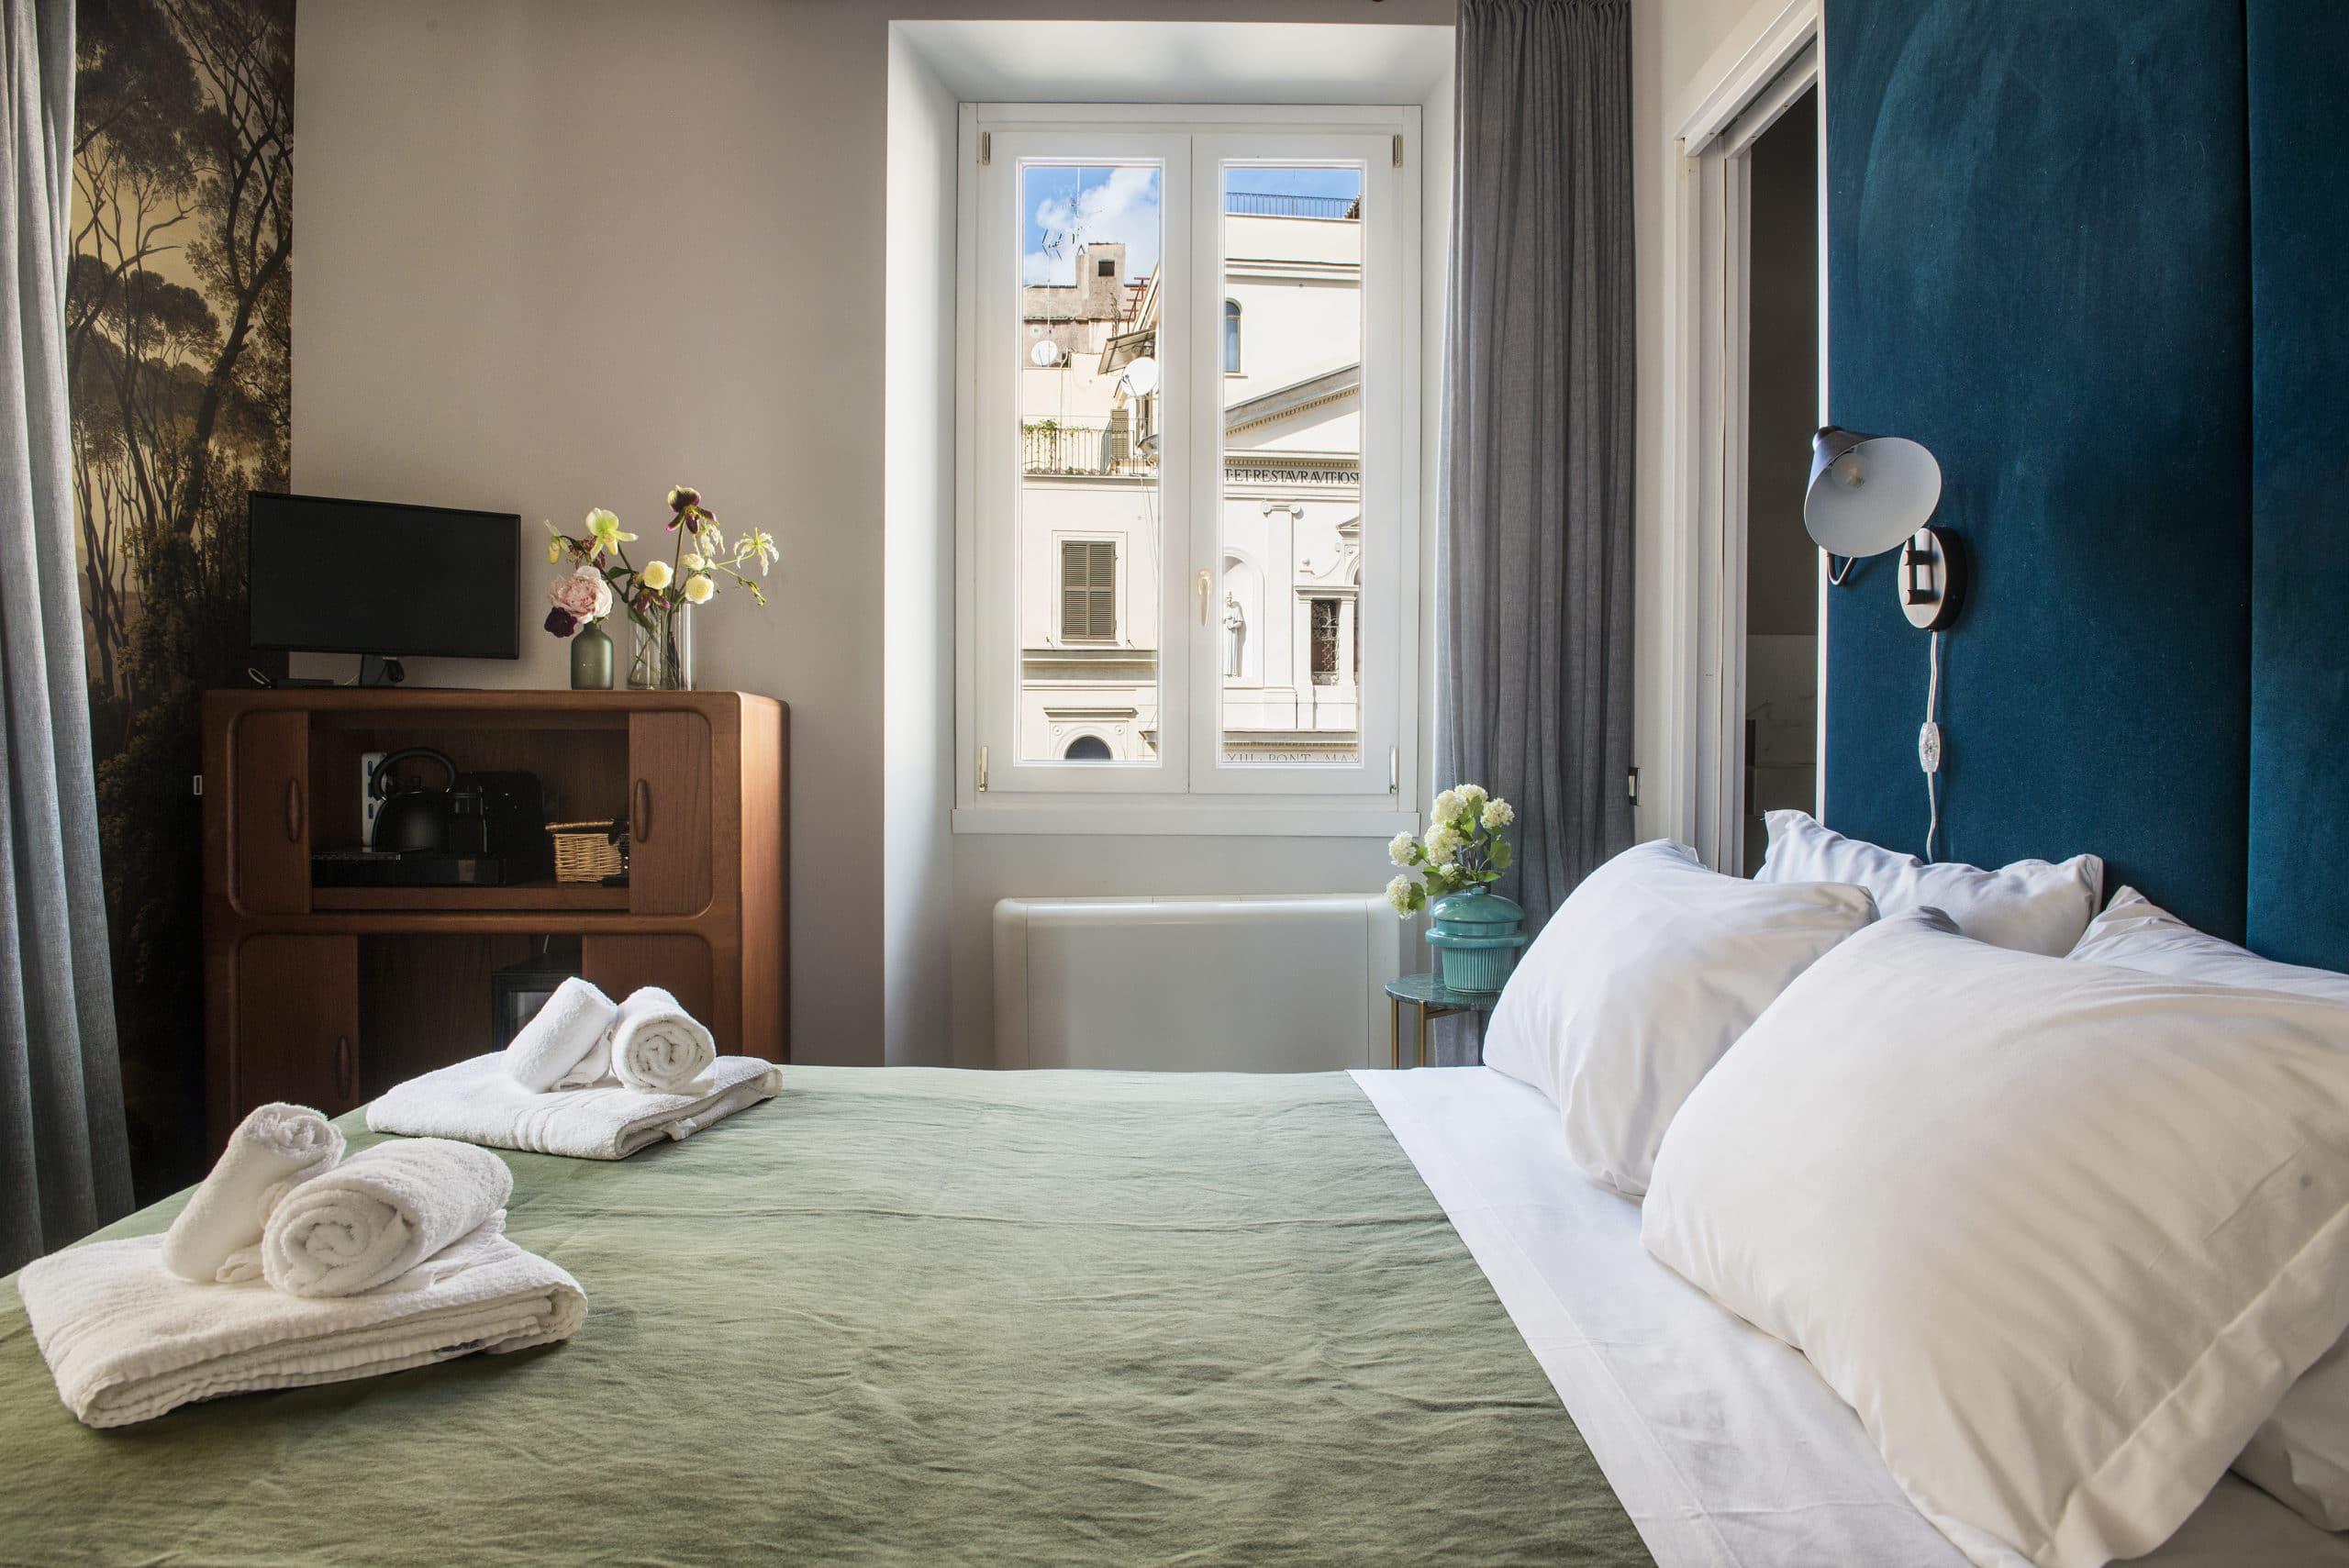 Hotel Bed image Buonanotte Colosseo B&B